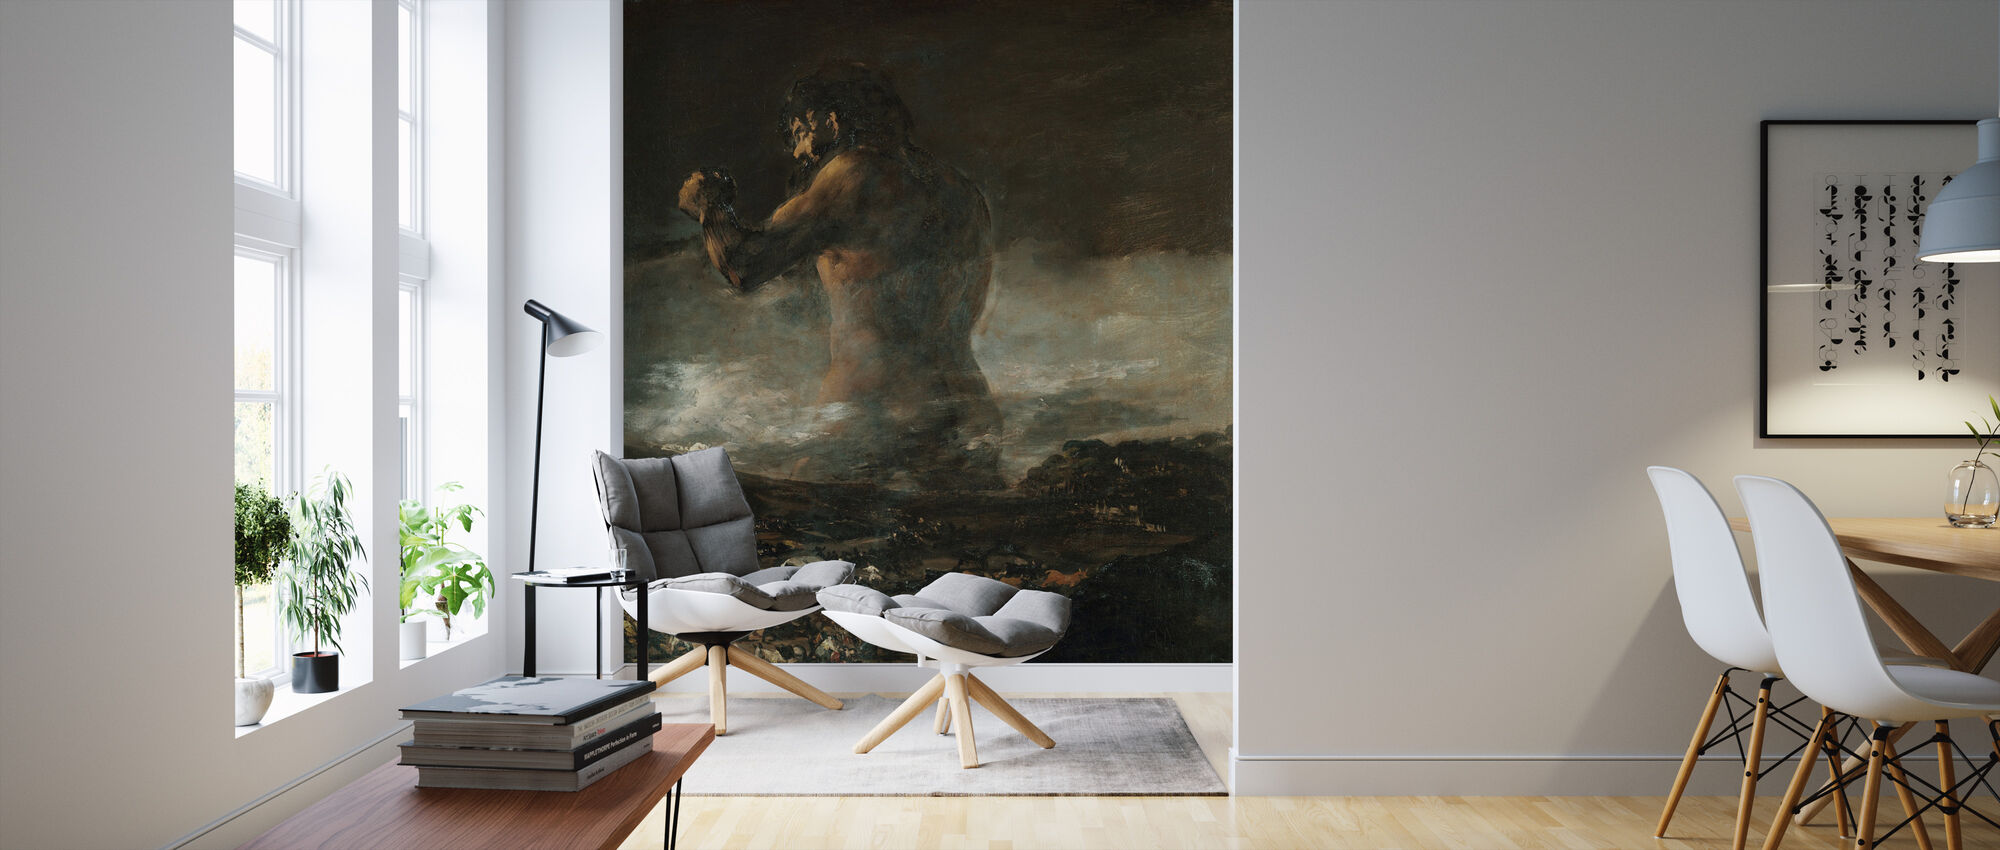 Francisco Goya - Colossus - Wallpaper - Living Room